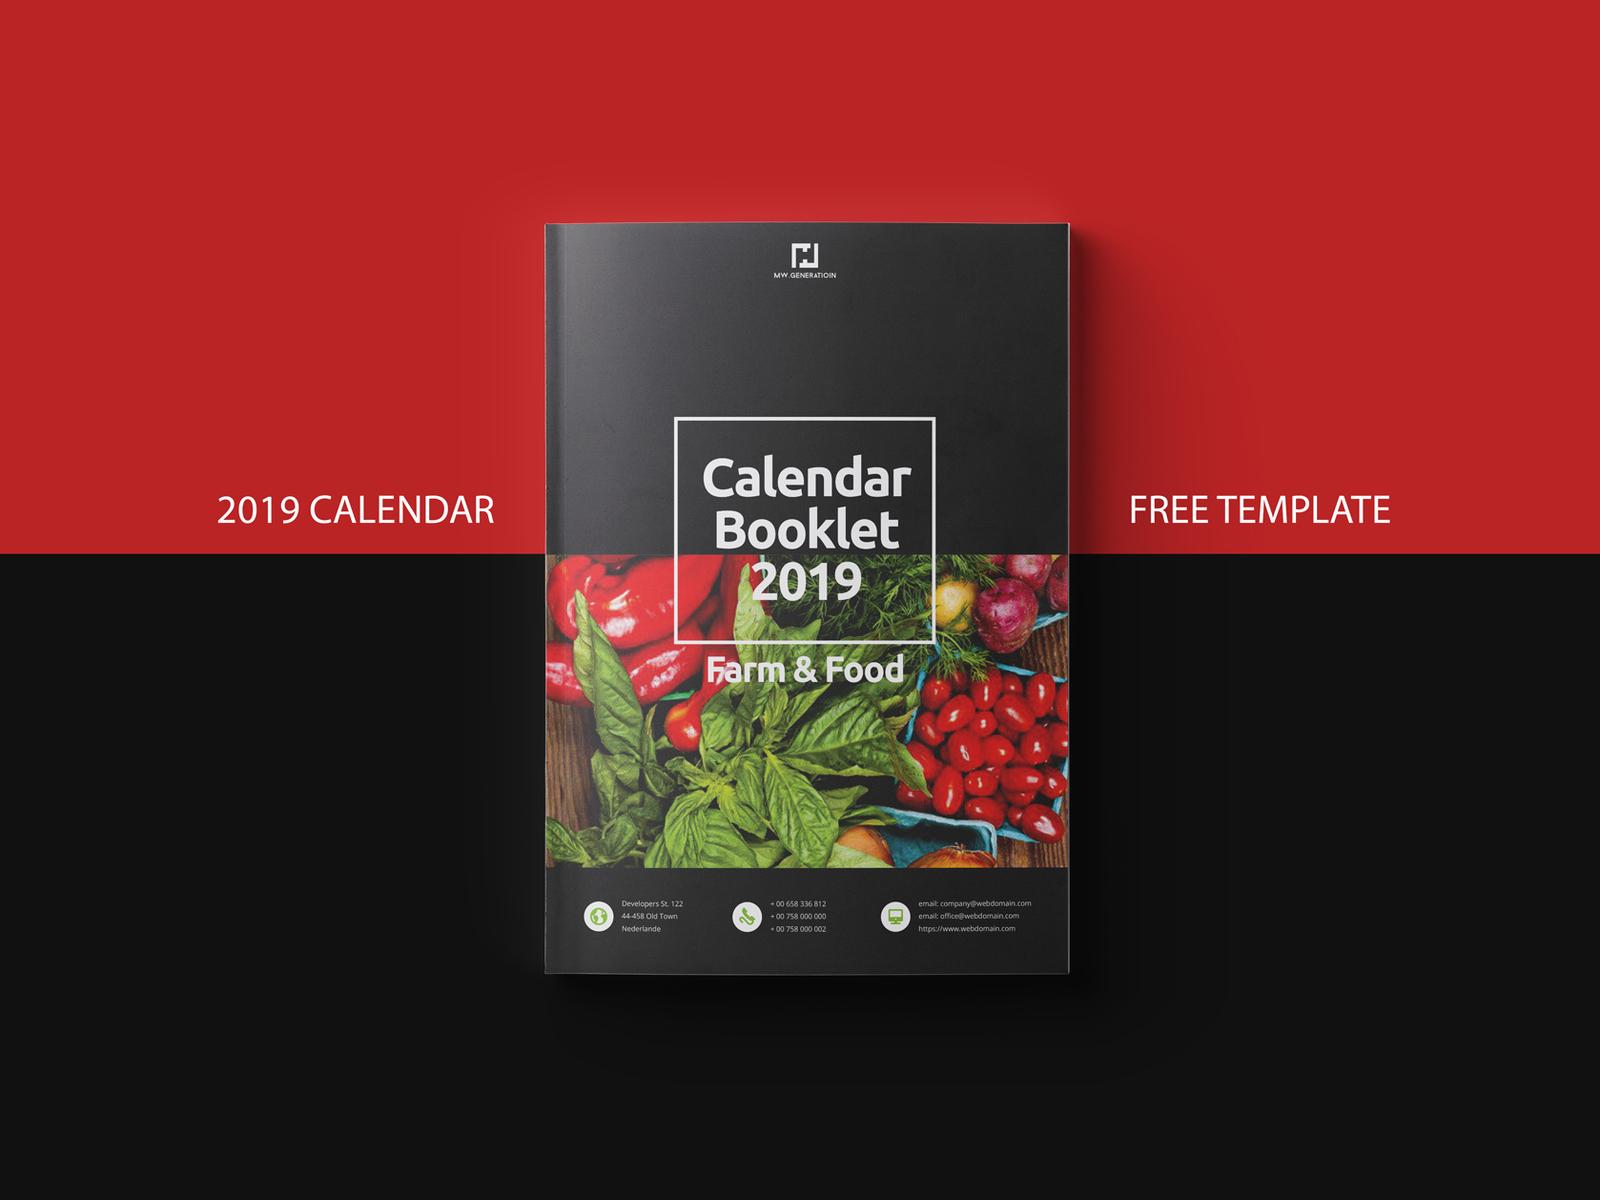 Free Template Calendar 2019 By Braxas Dribbble